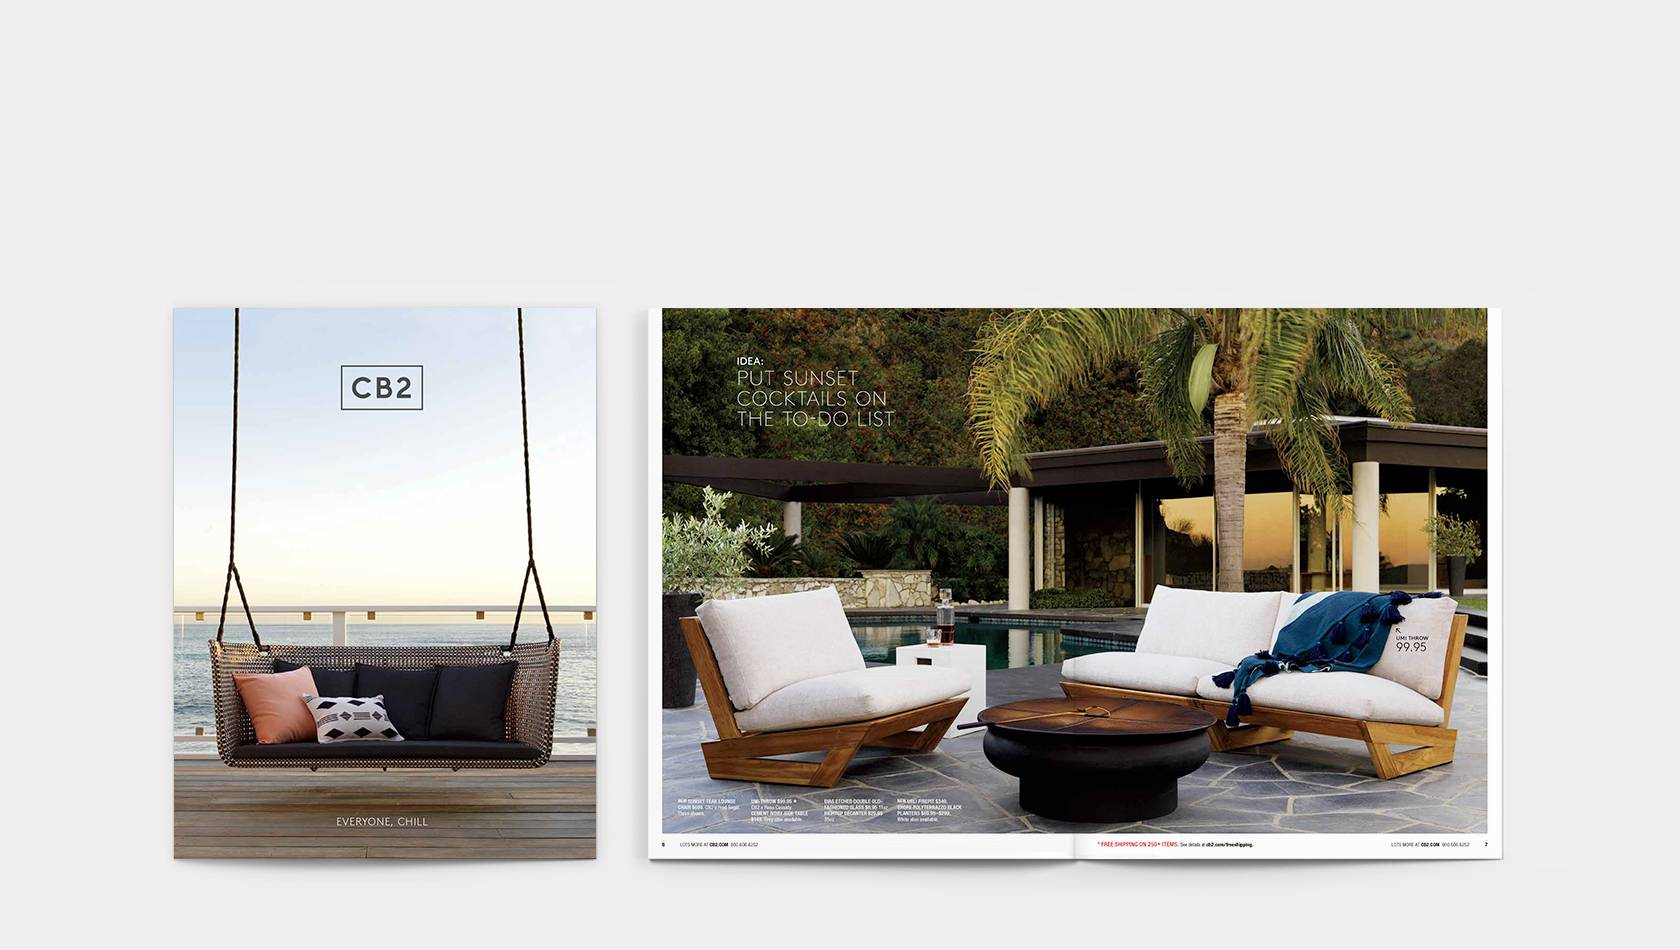 Modern Furniture and Home Decor | CB2